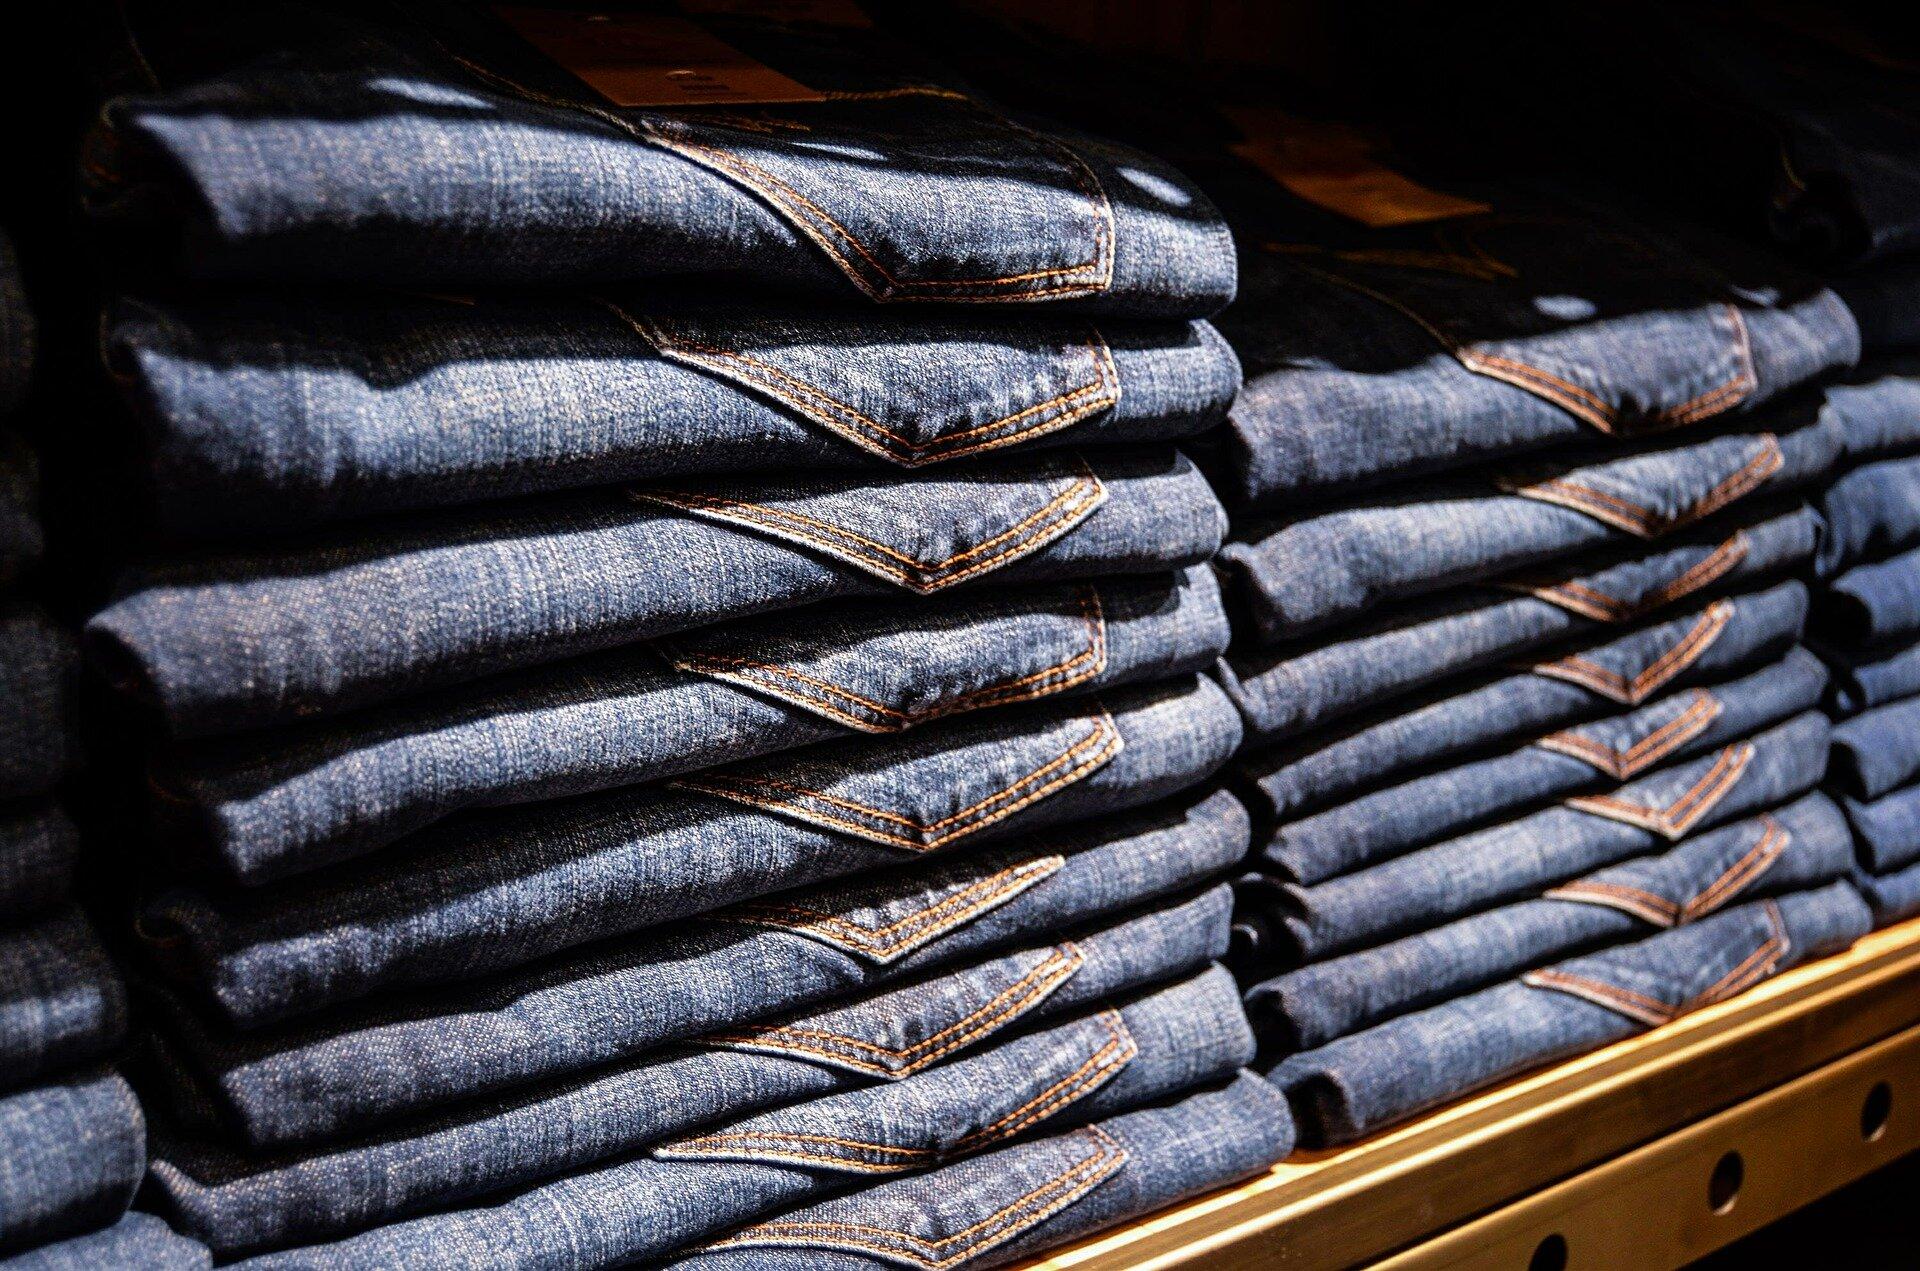 jeans-428613_1920.jpg